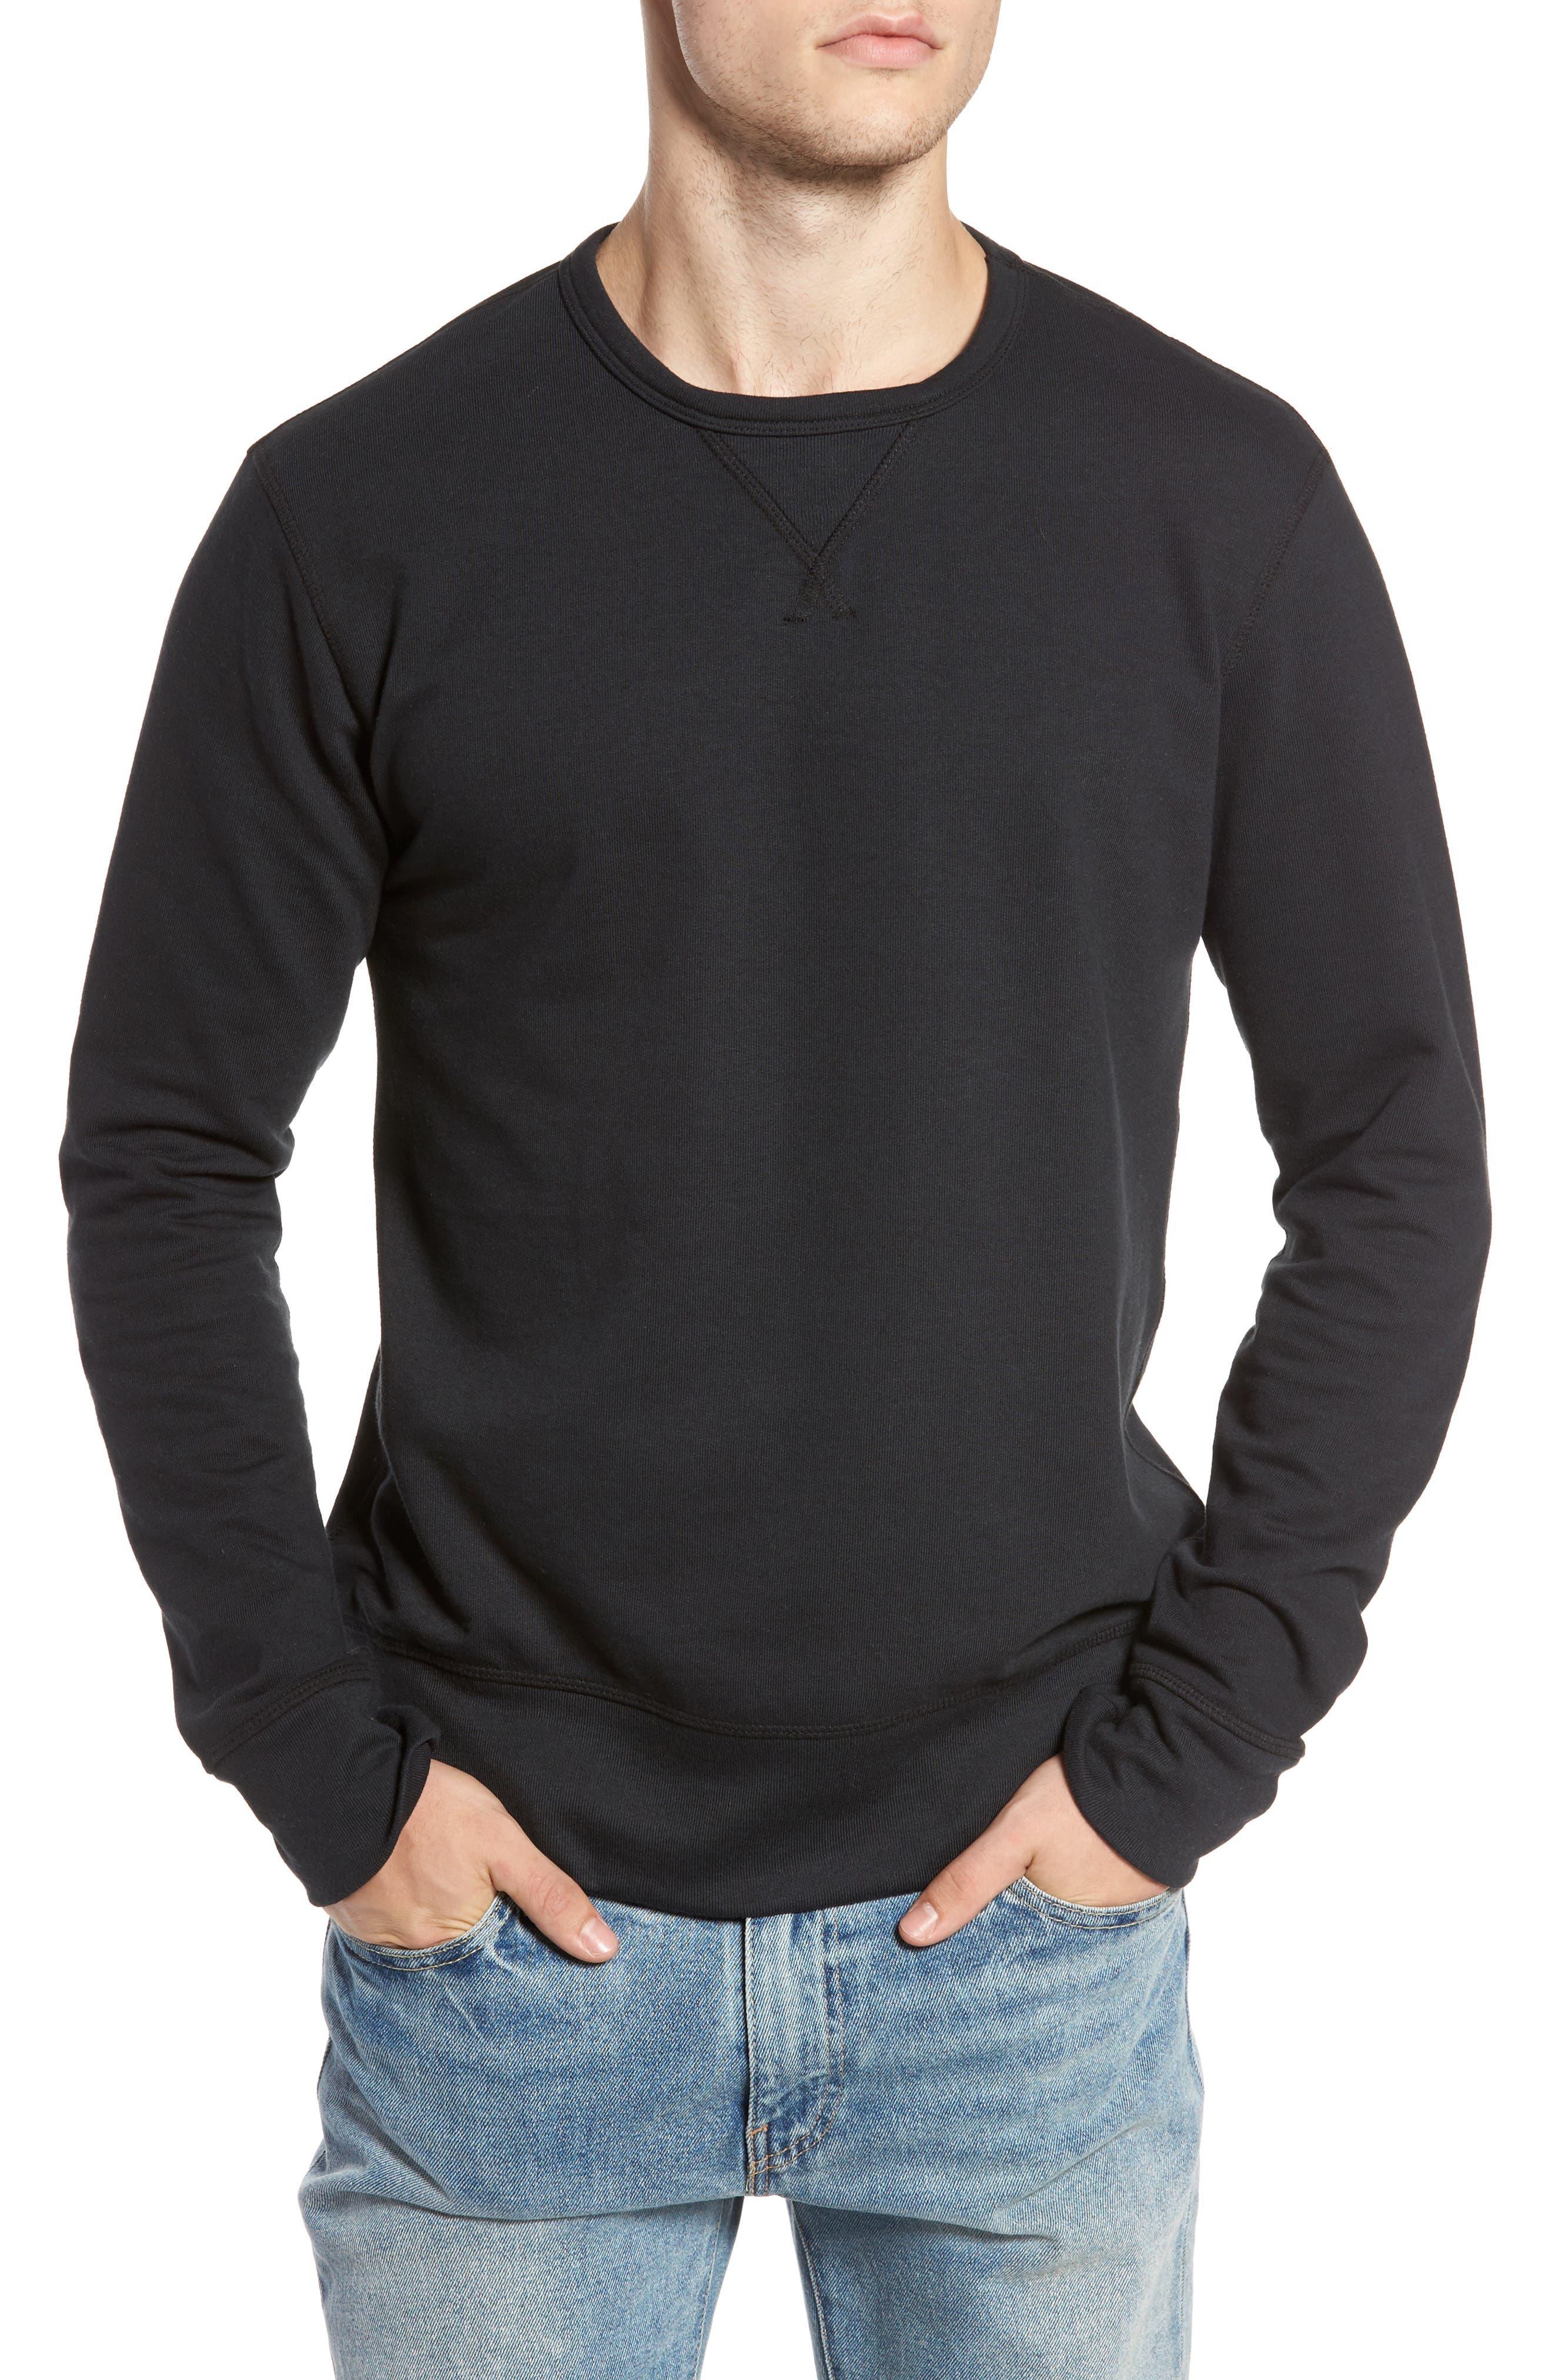 B-Side Reversible Crewneck Sweatshirt,                             Main thumbnail 1, color,                             001